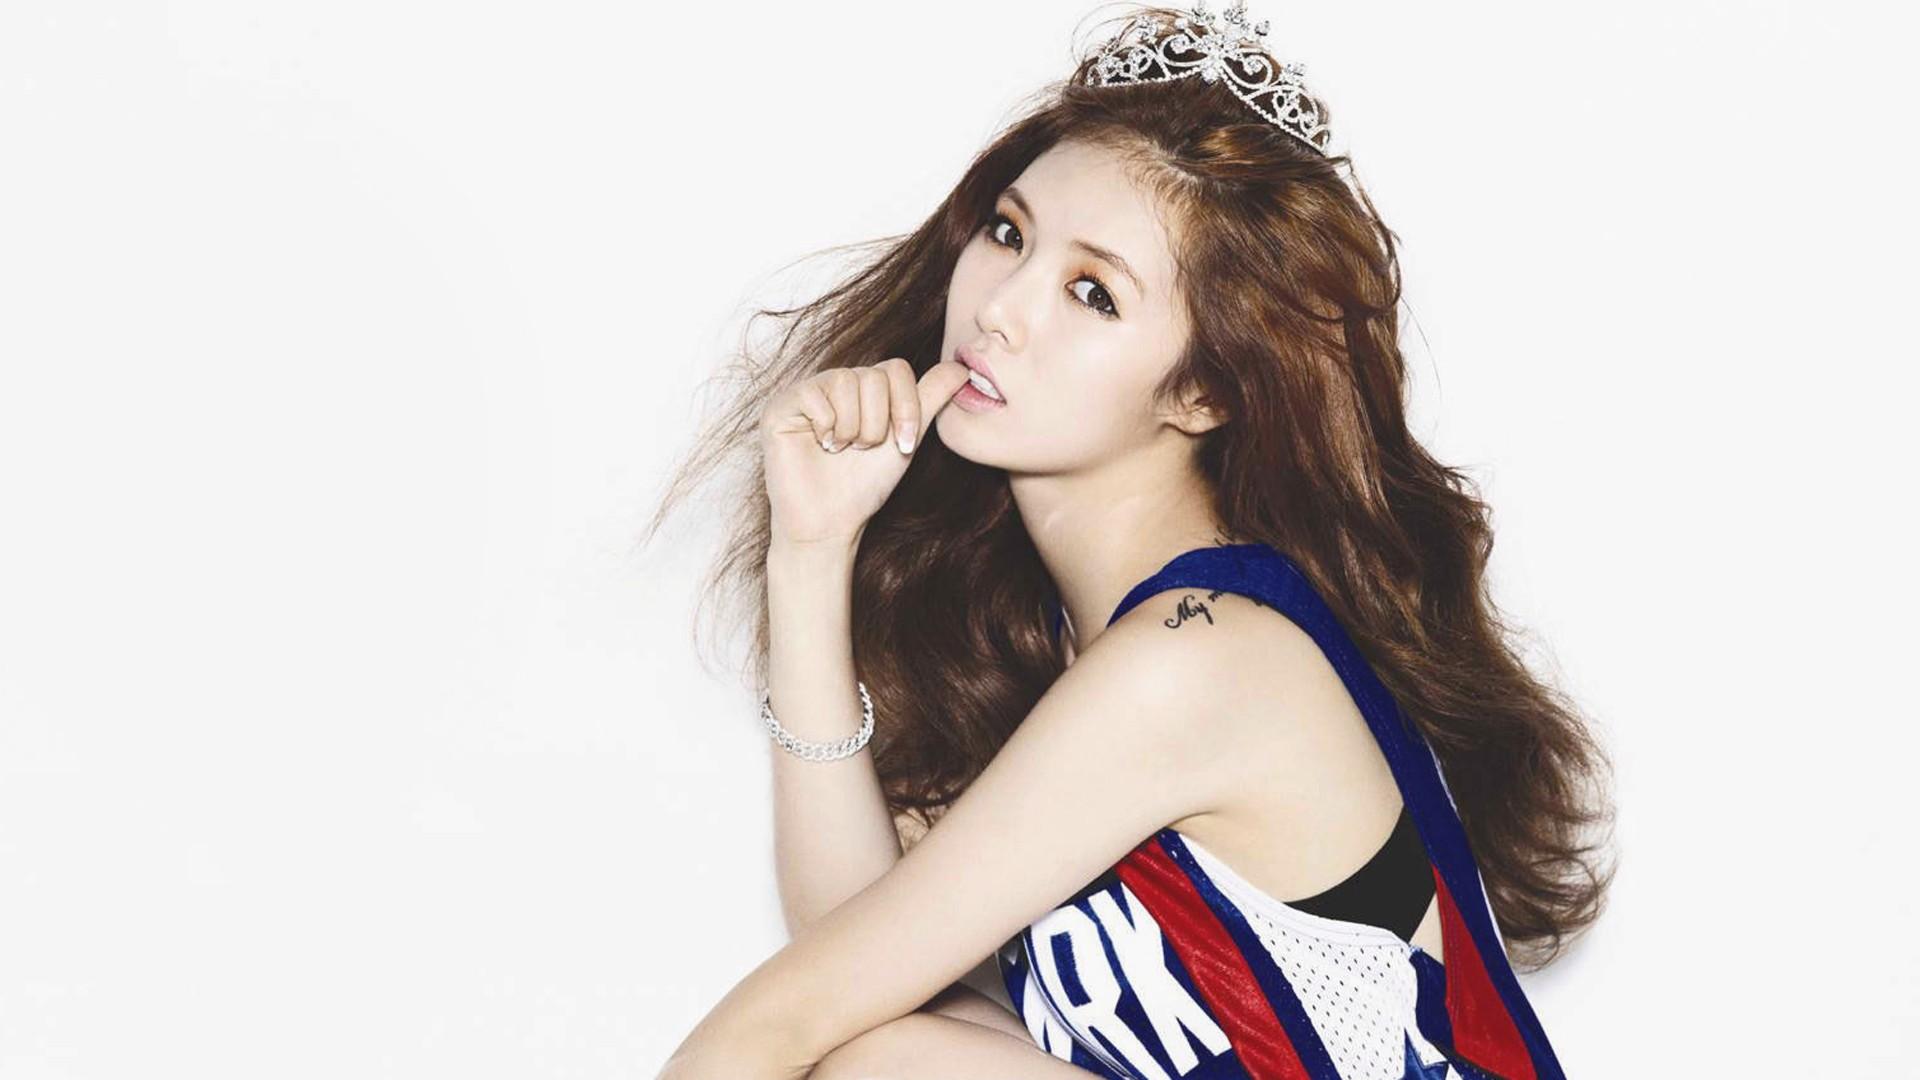 9 Hd Hyuna Kim Wallpapers